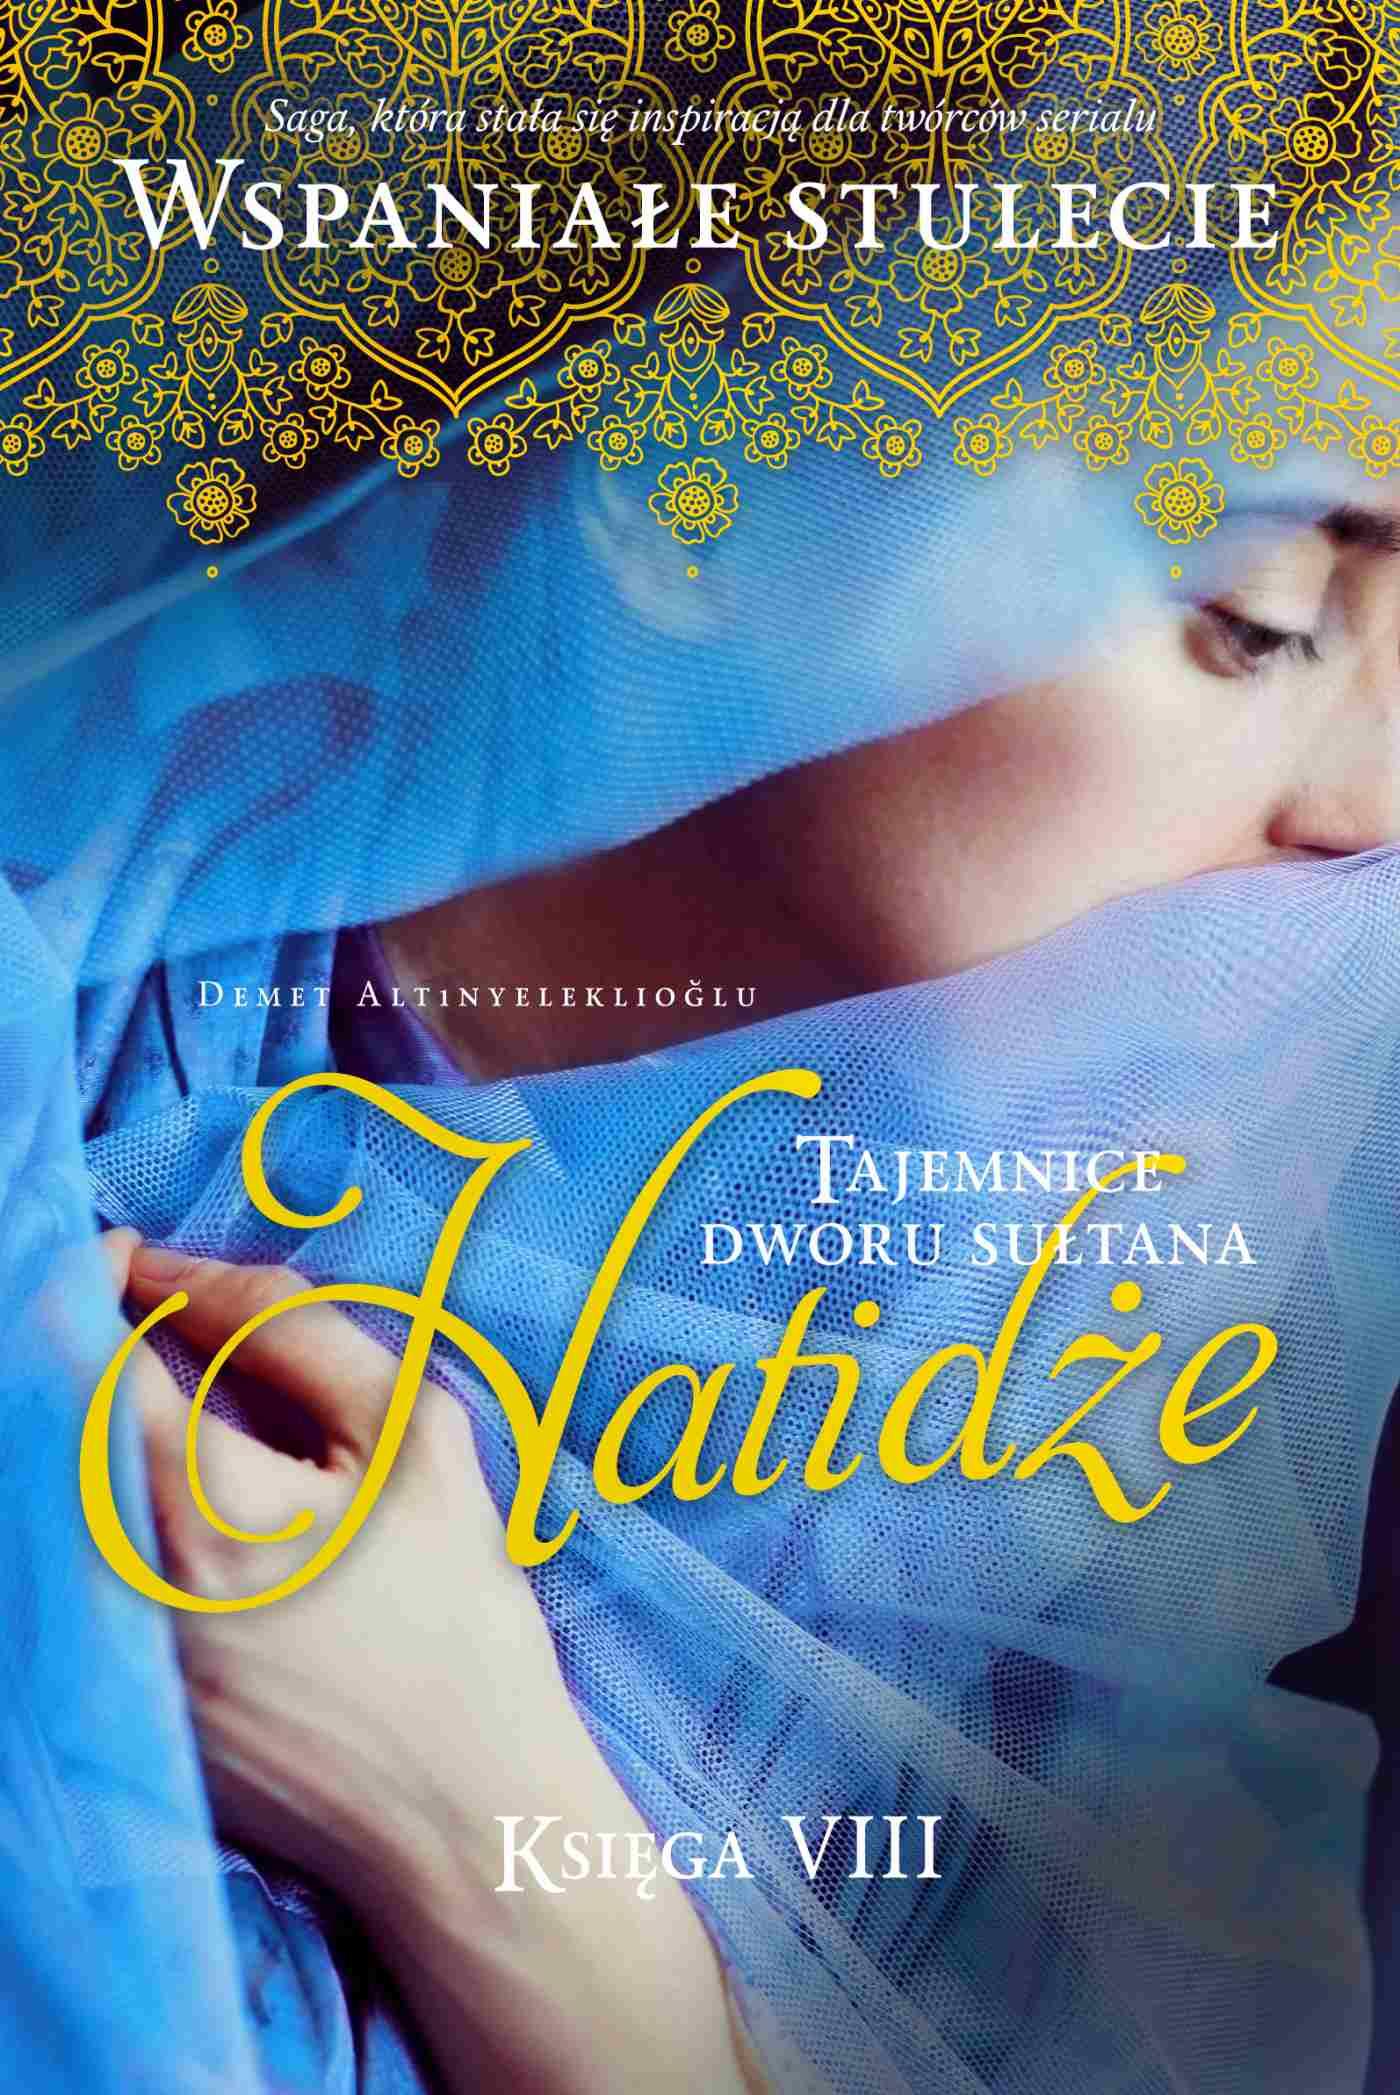 Tajemnice dworu sułtana. Hatidże. Księga 8 - Ebook (Książka na Kindle) do pobrania w formacie MOBI